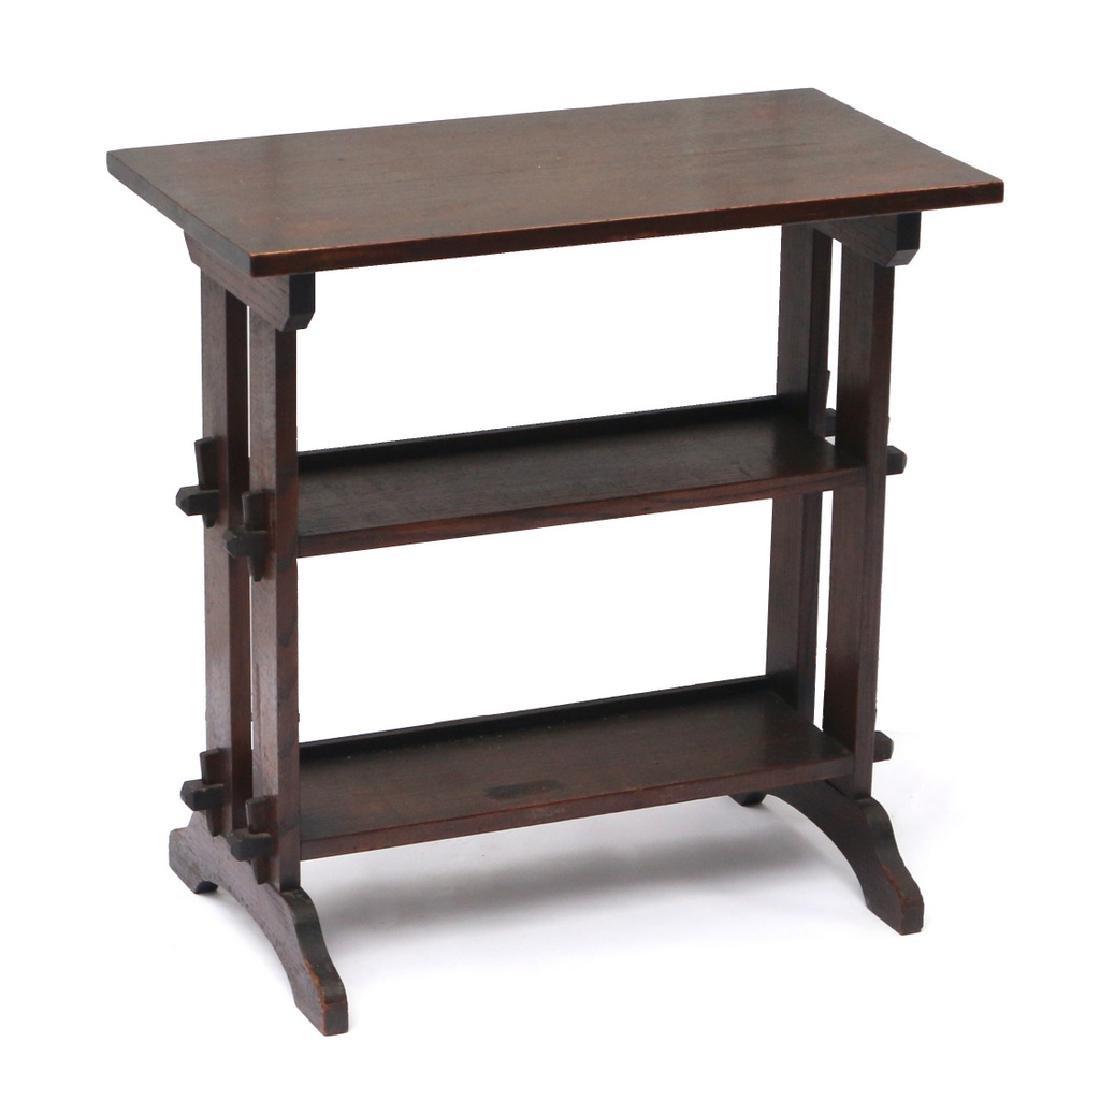 ROYCROFT SIDE TABLE